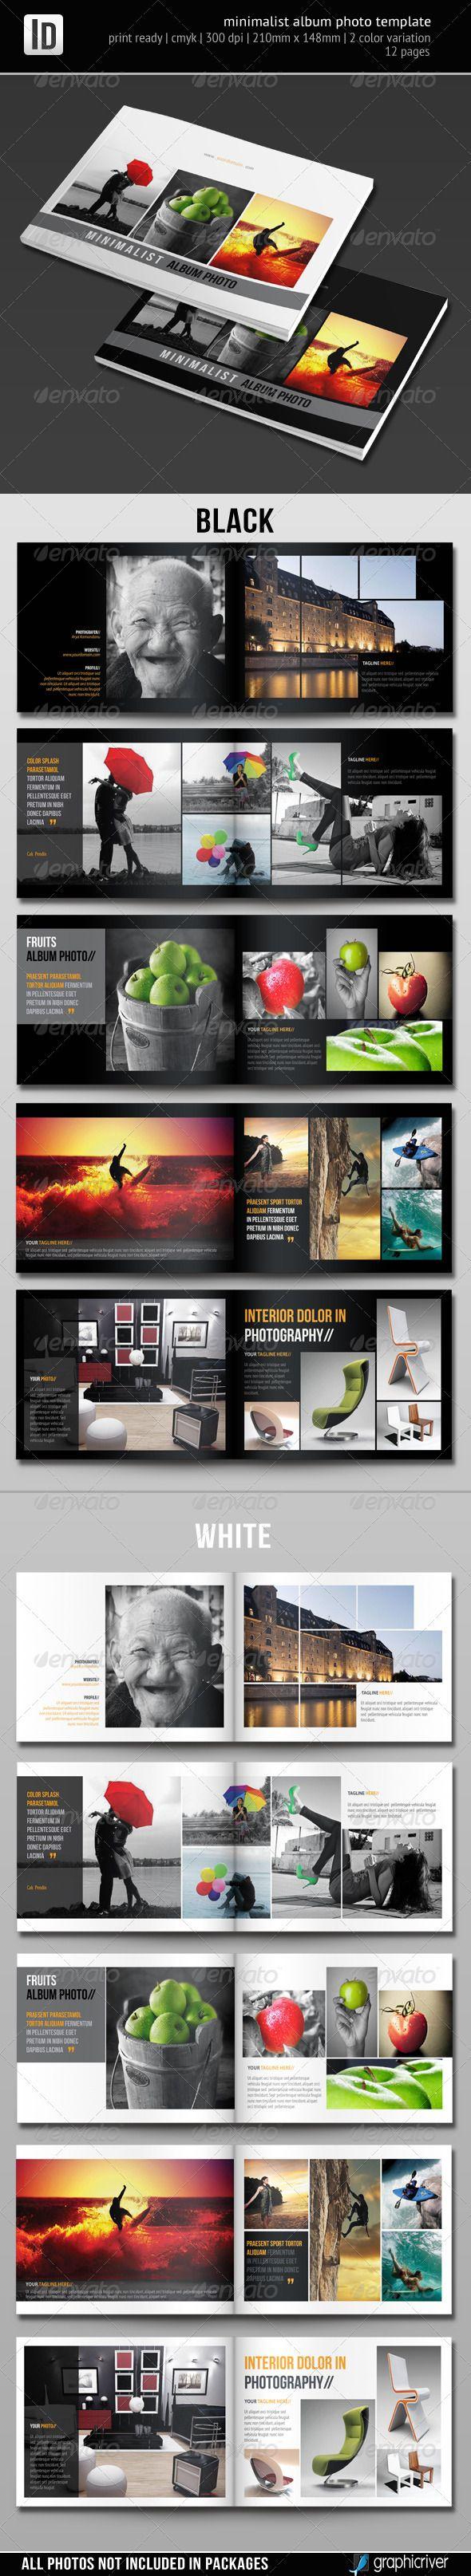 25 best Indesign images on Pinterest | Brochure template, Brochures ...